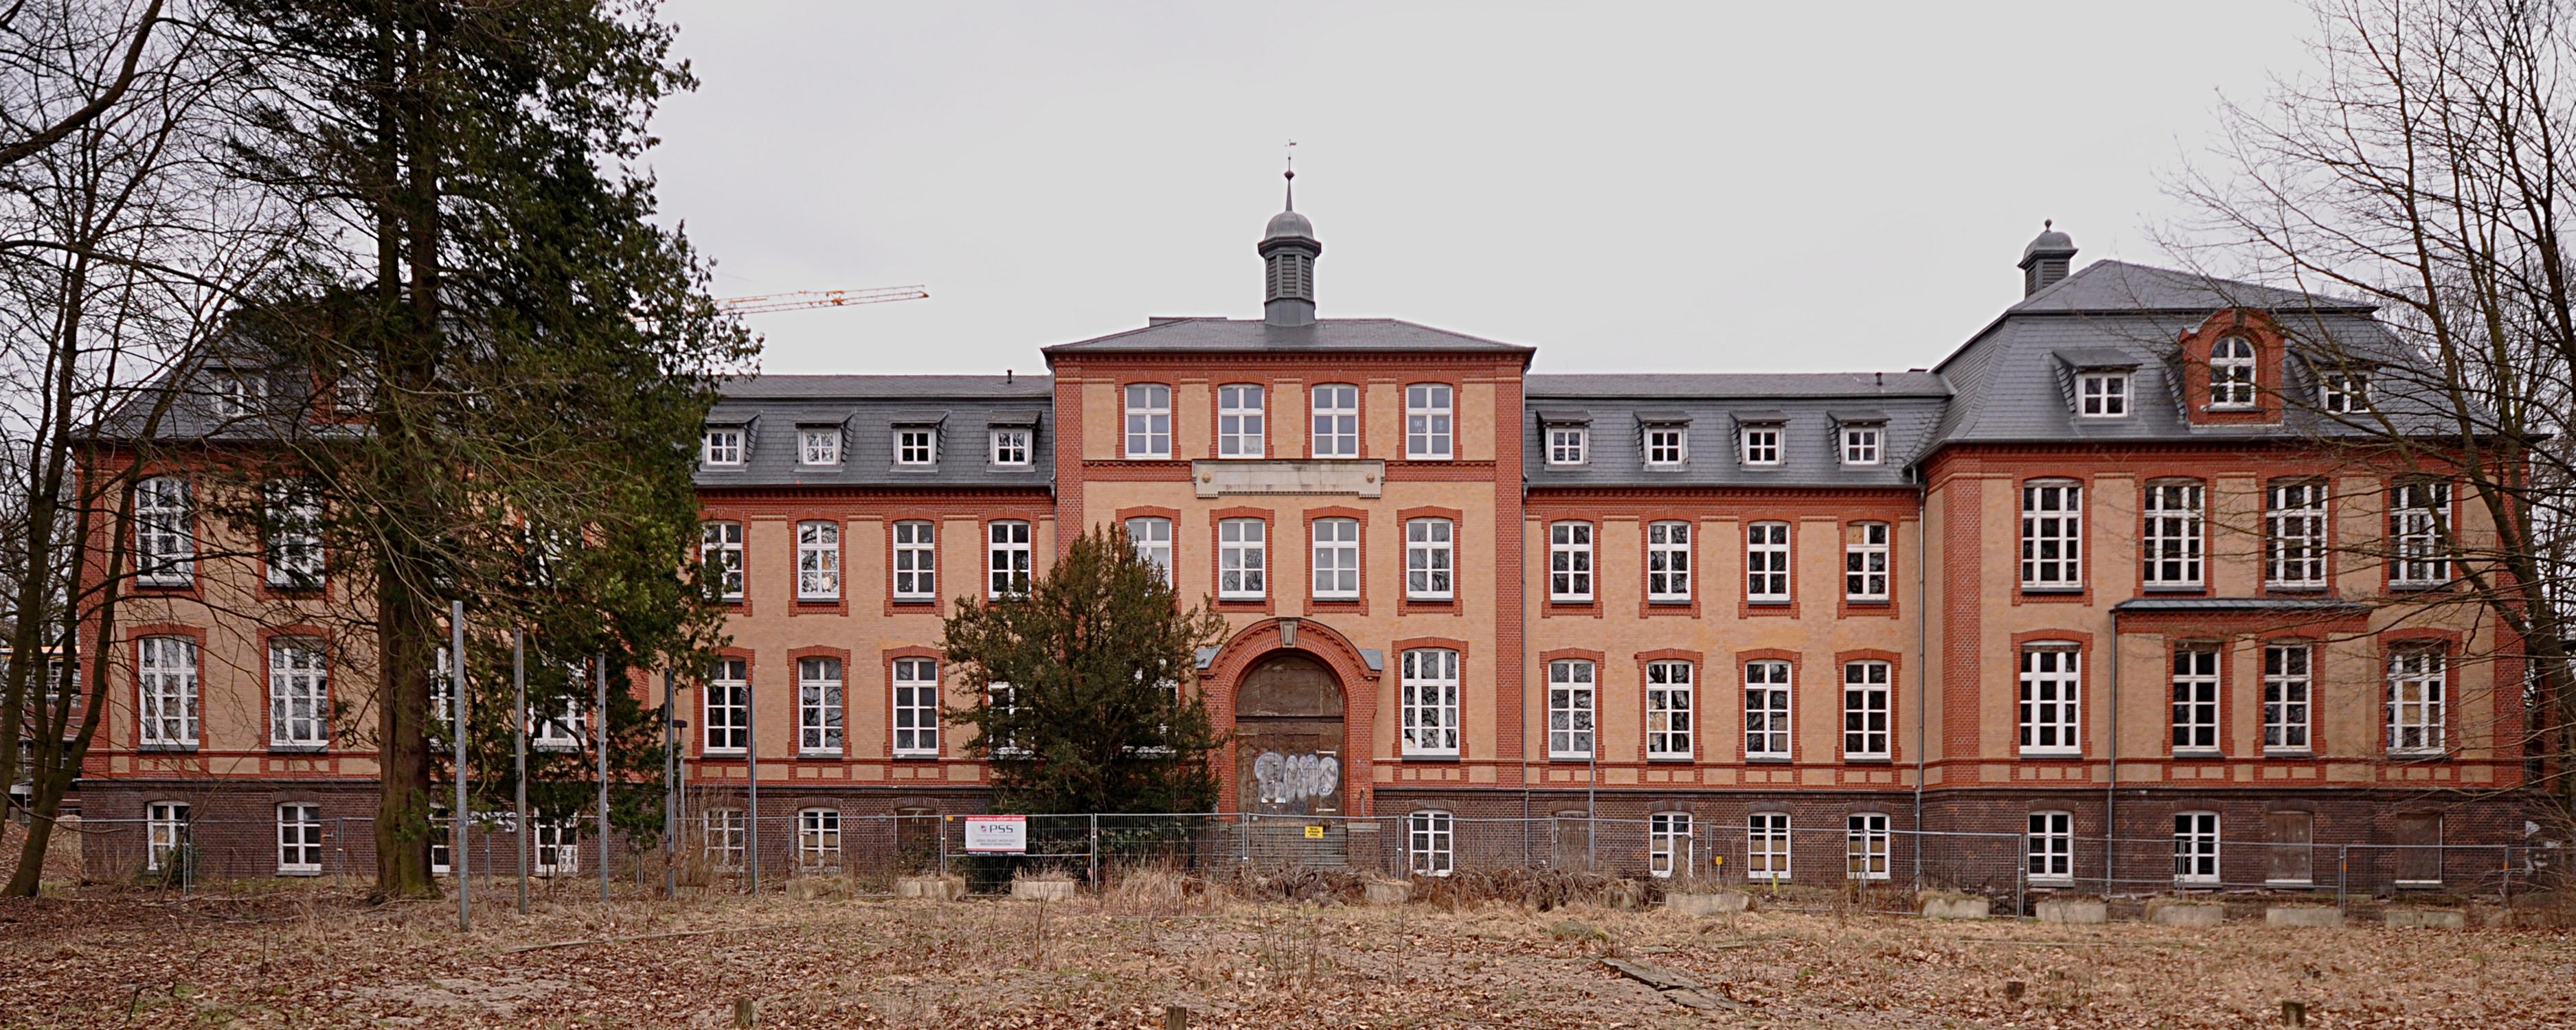 file pestalozzi stiftung hamburg volksdorf wikimedia commons. Black Bedroom Furniture Sets. Home Design Ideas